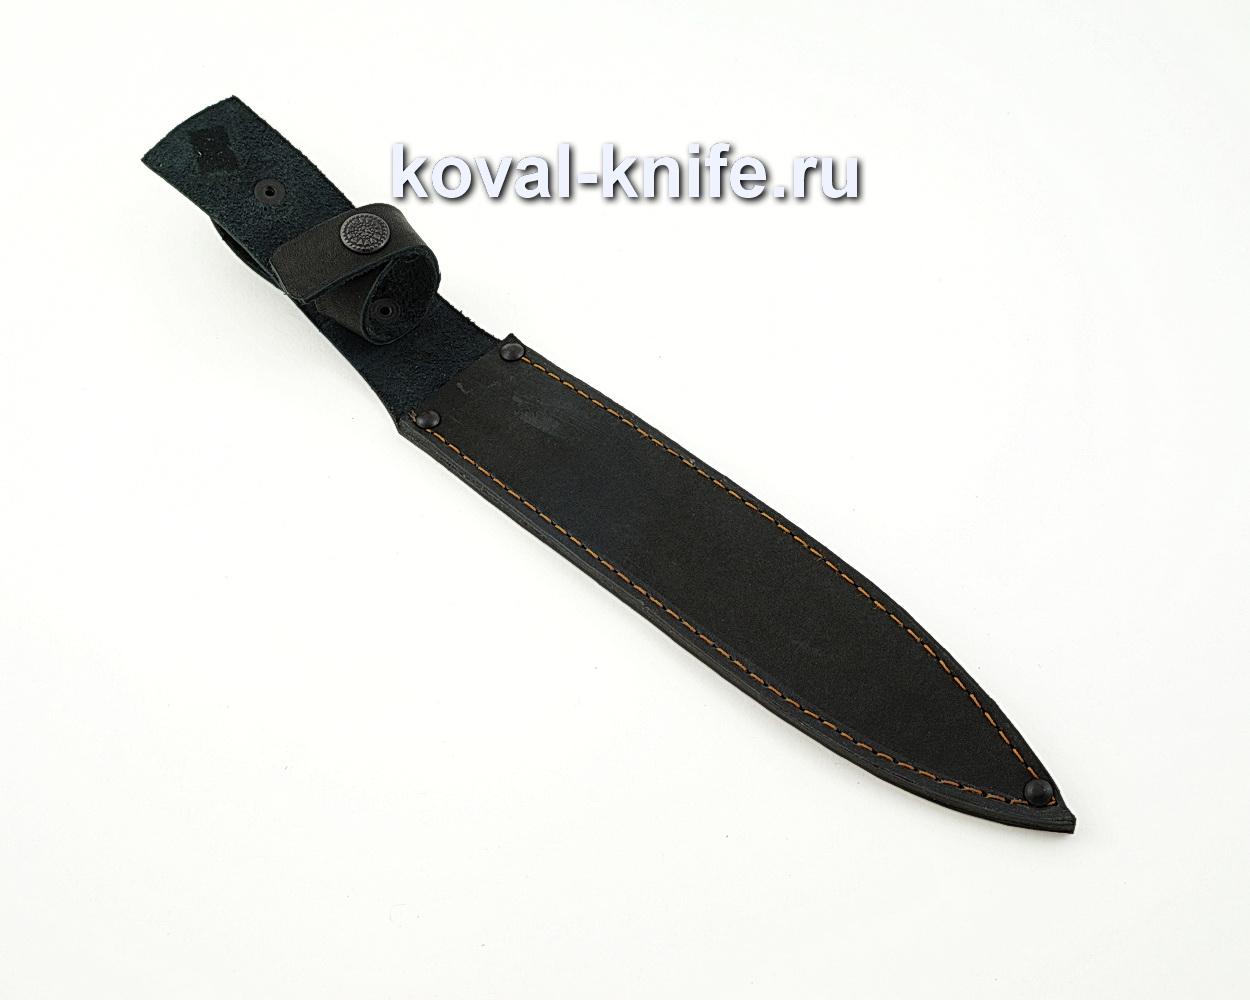 Кожаный чехол (нож Стилет)